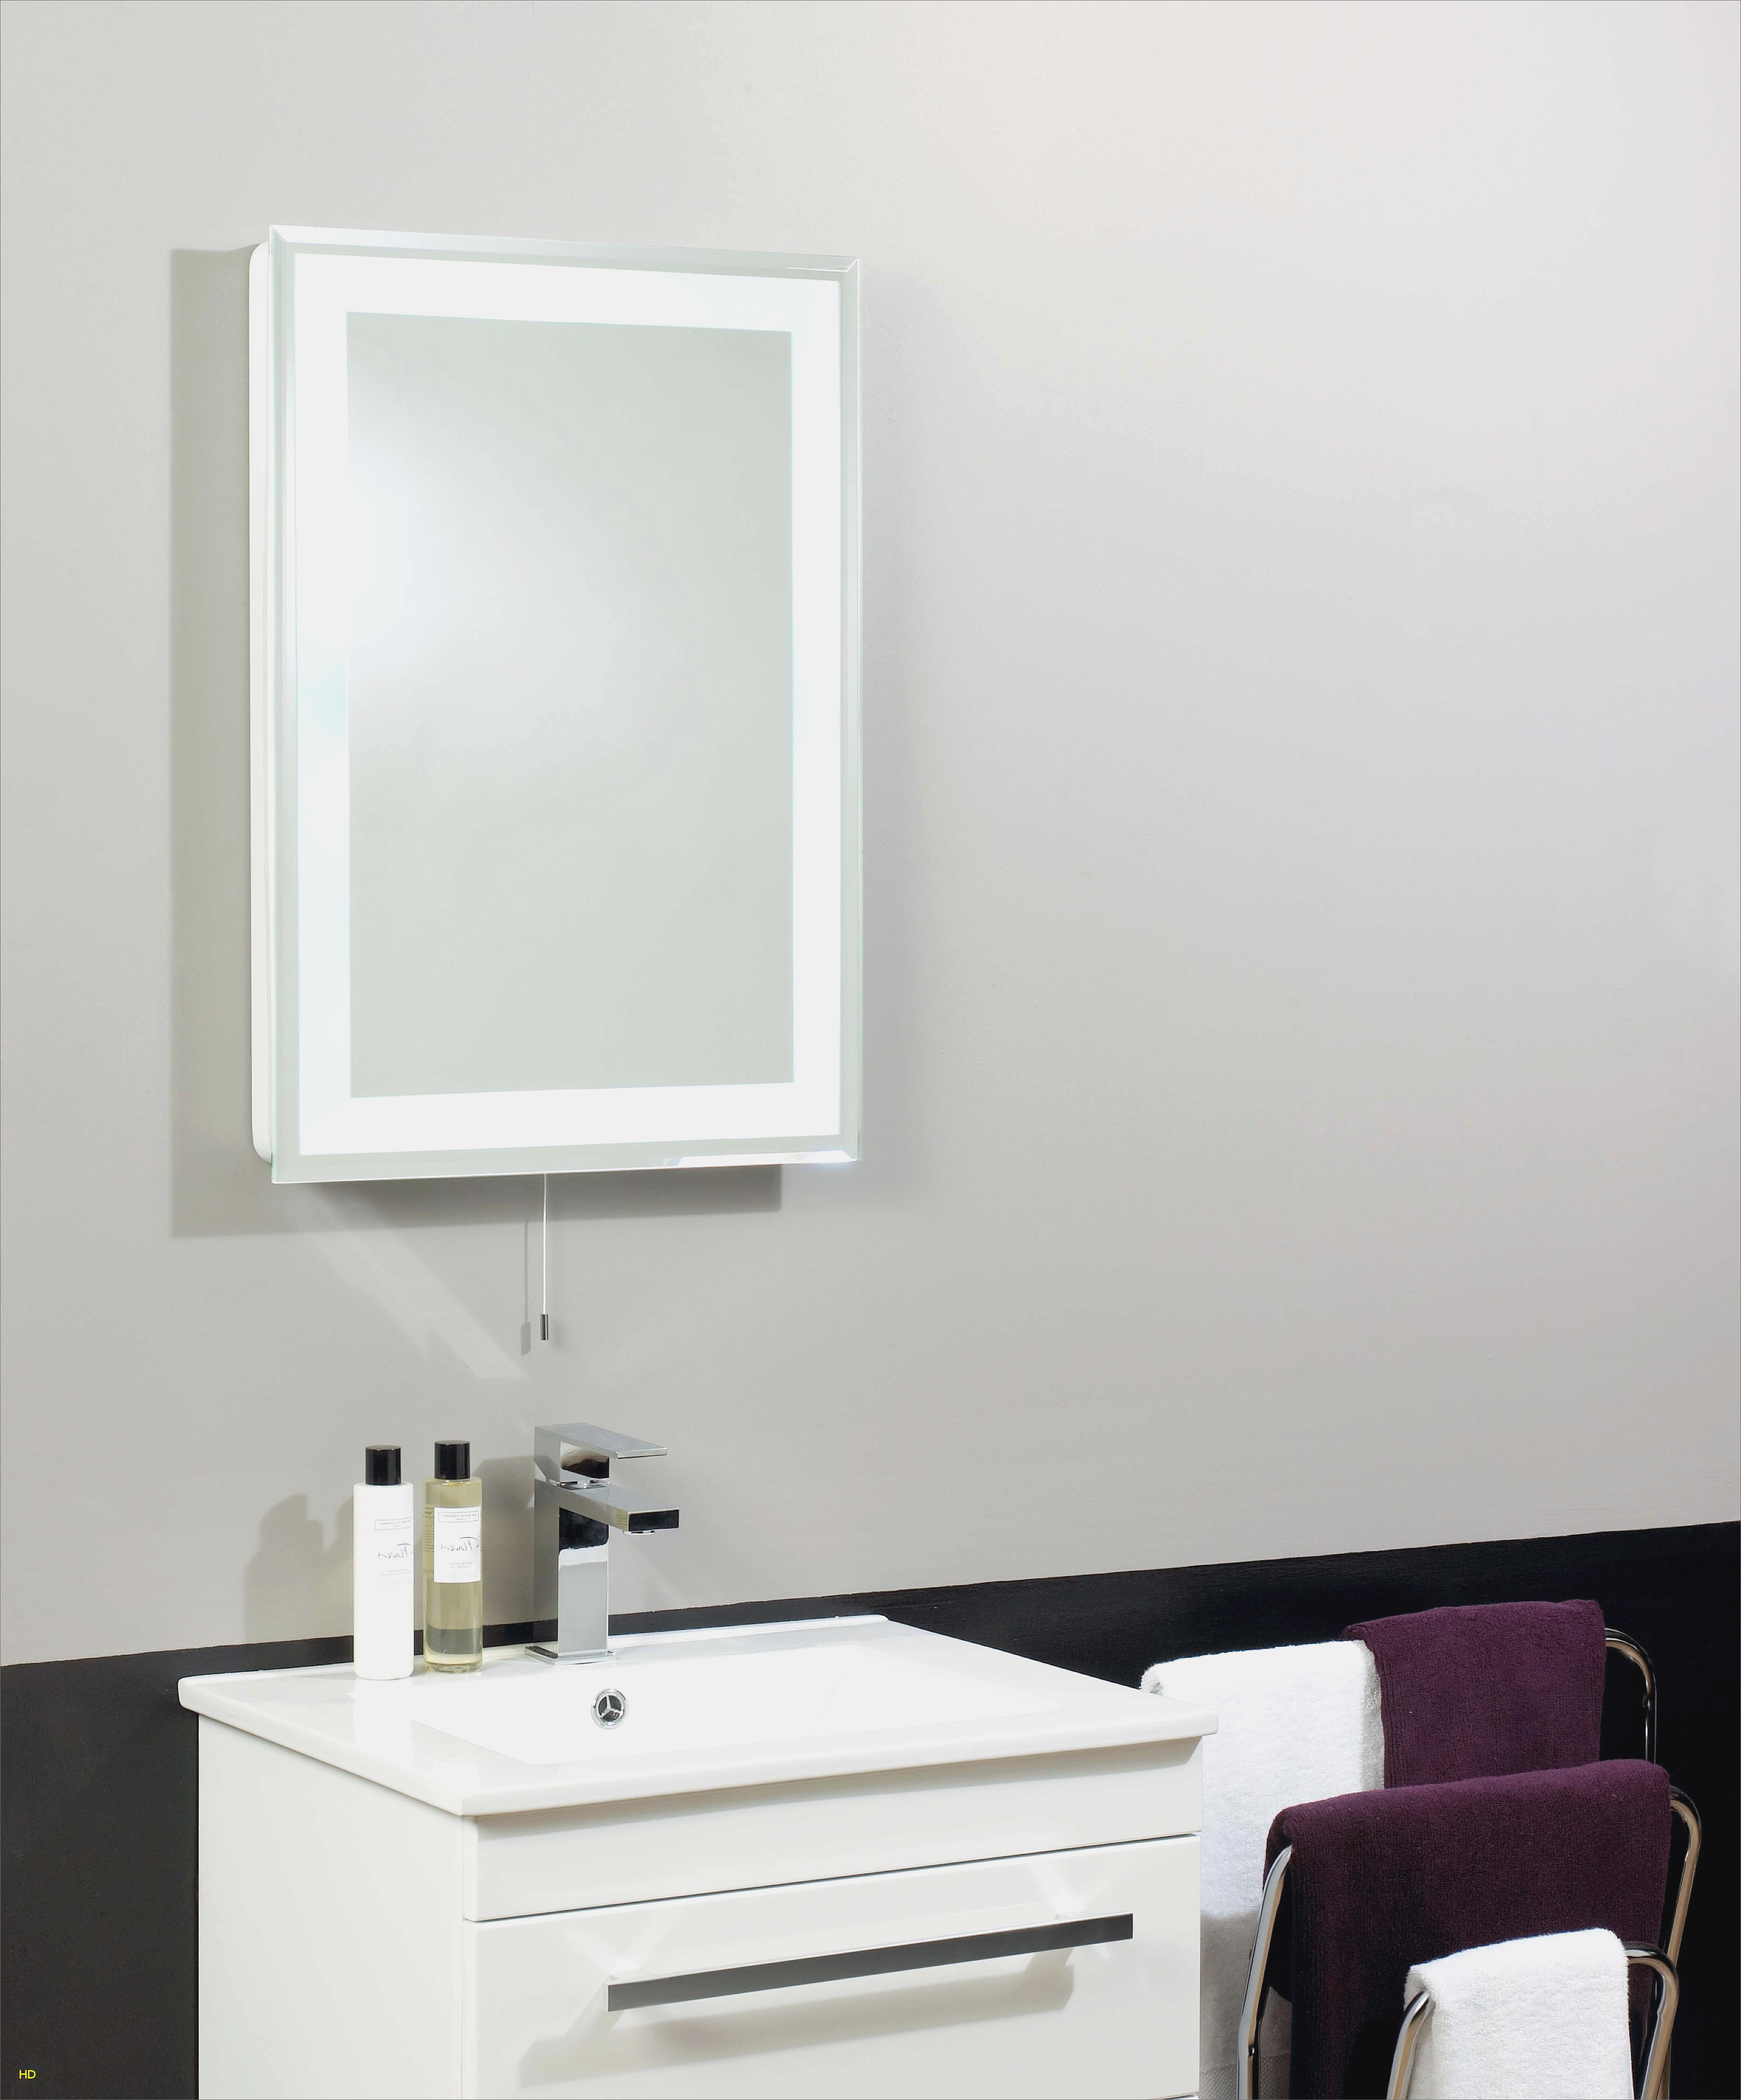 Lampe Salle De Bain Castorama Inspirant Photos Impressionnant Applique Salle De Bain Castorama Rental